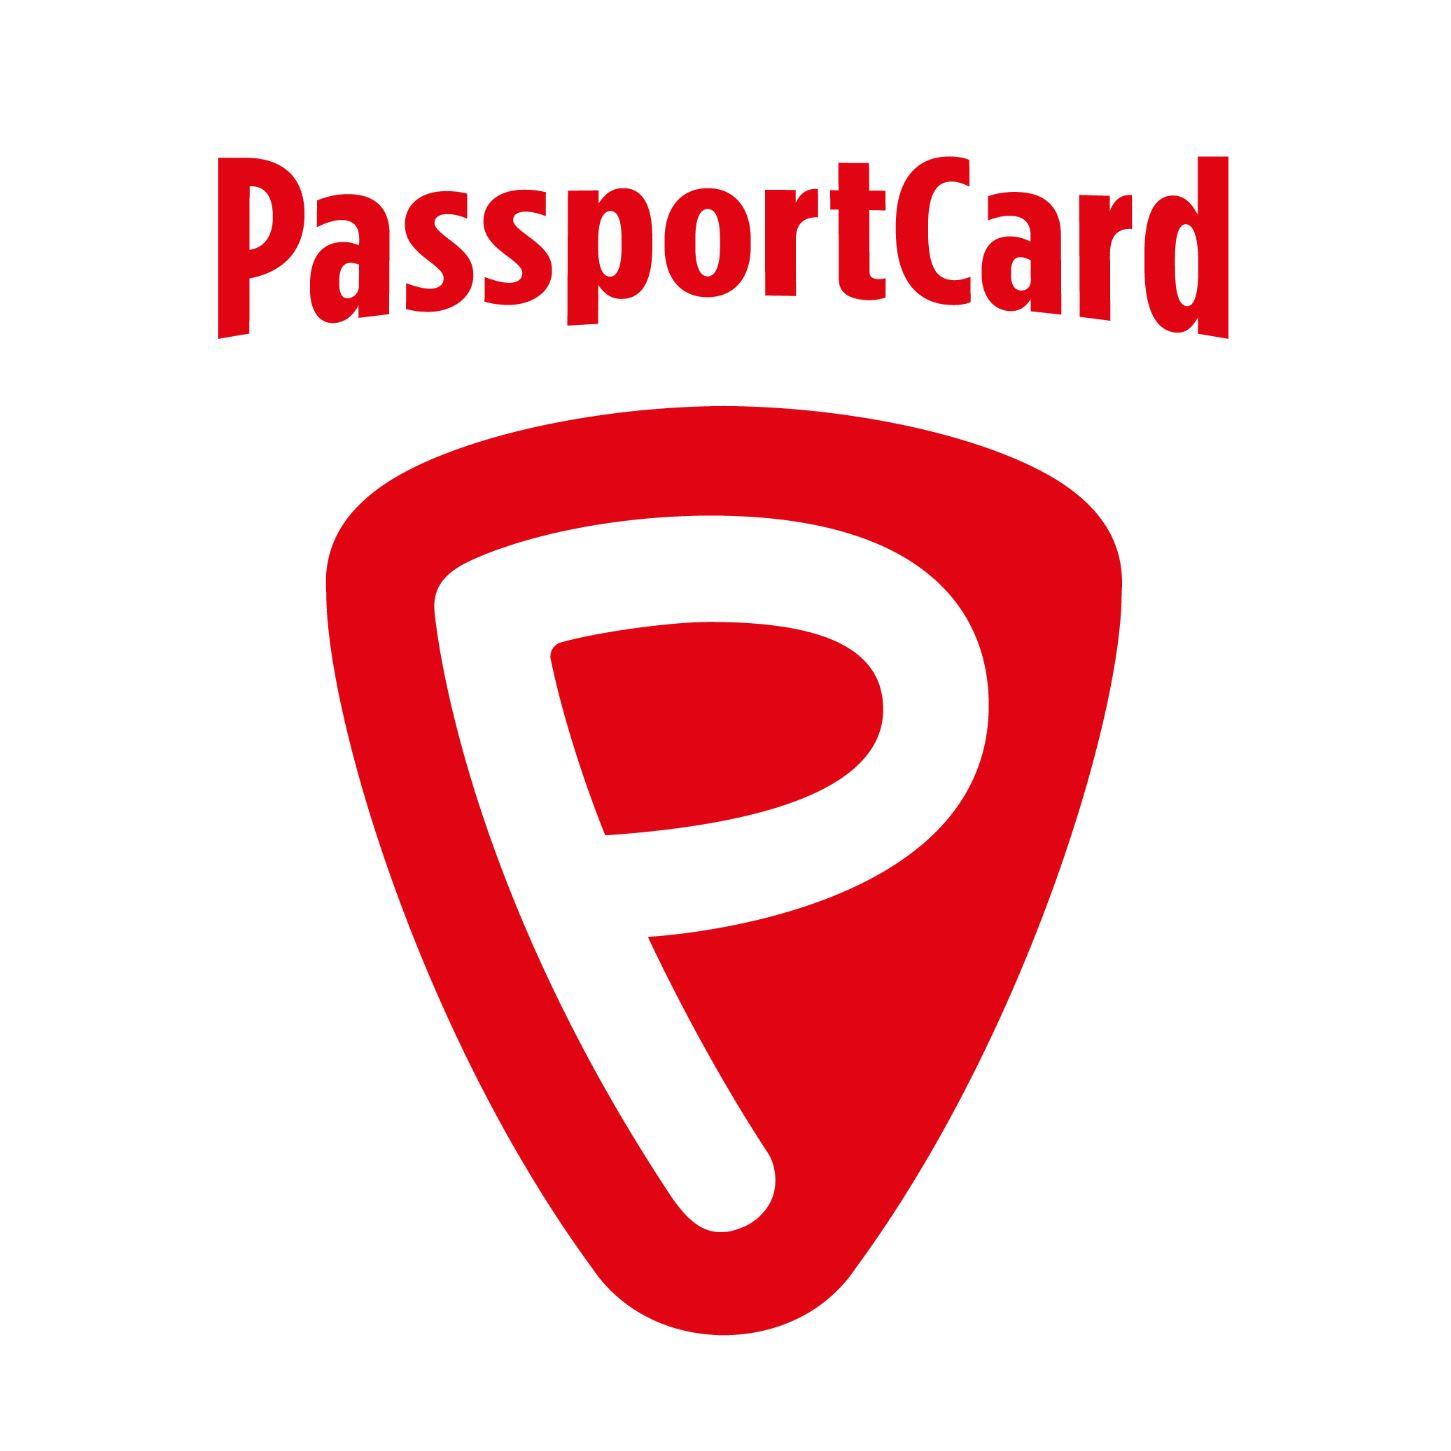 PassportCard story